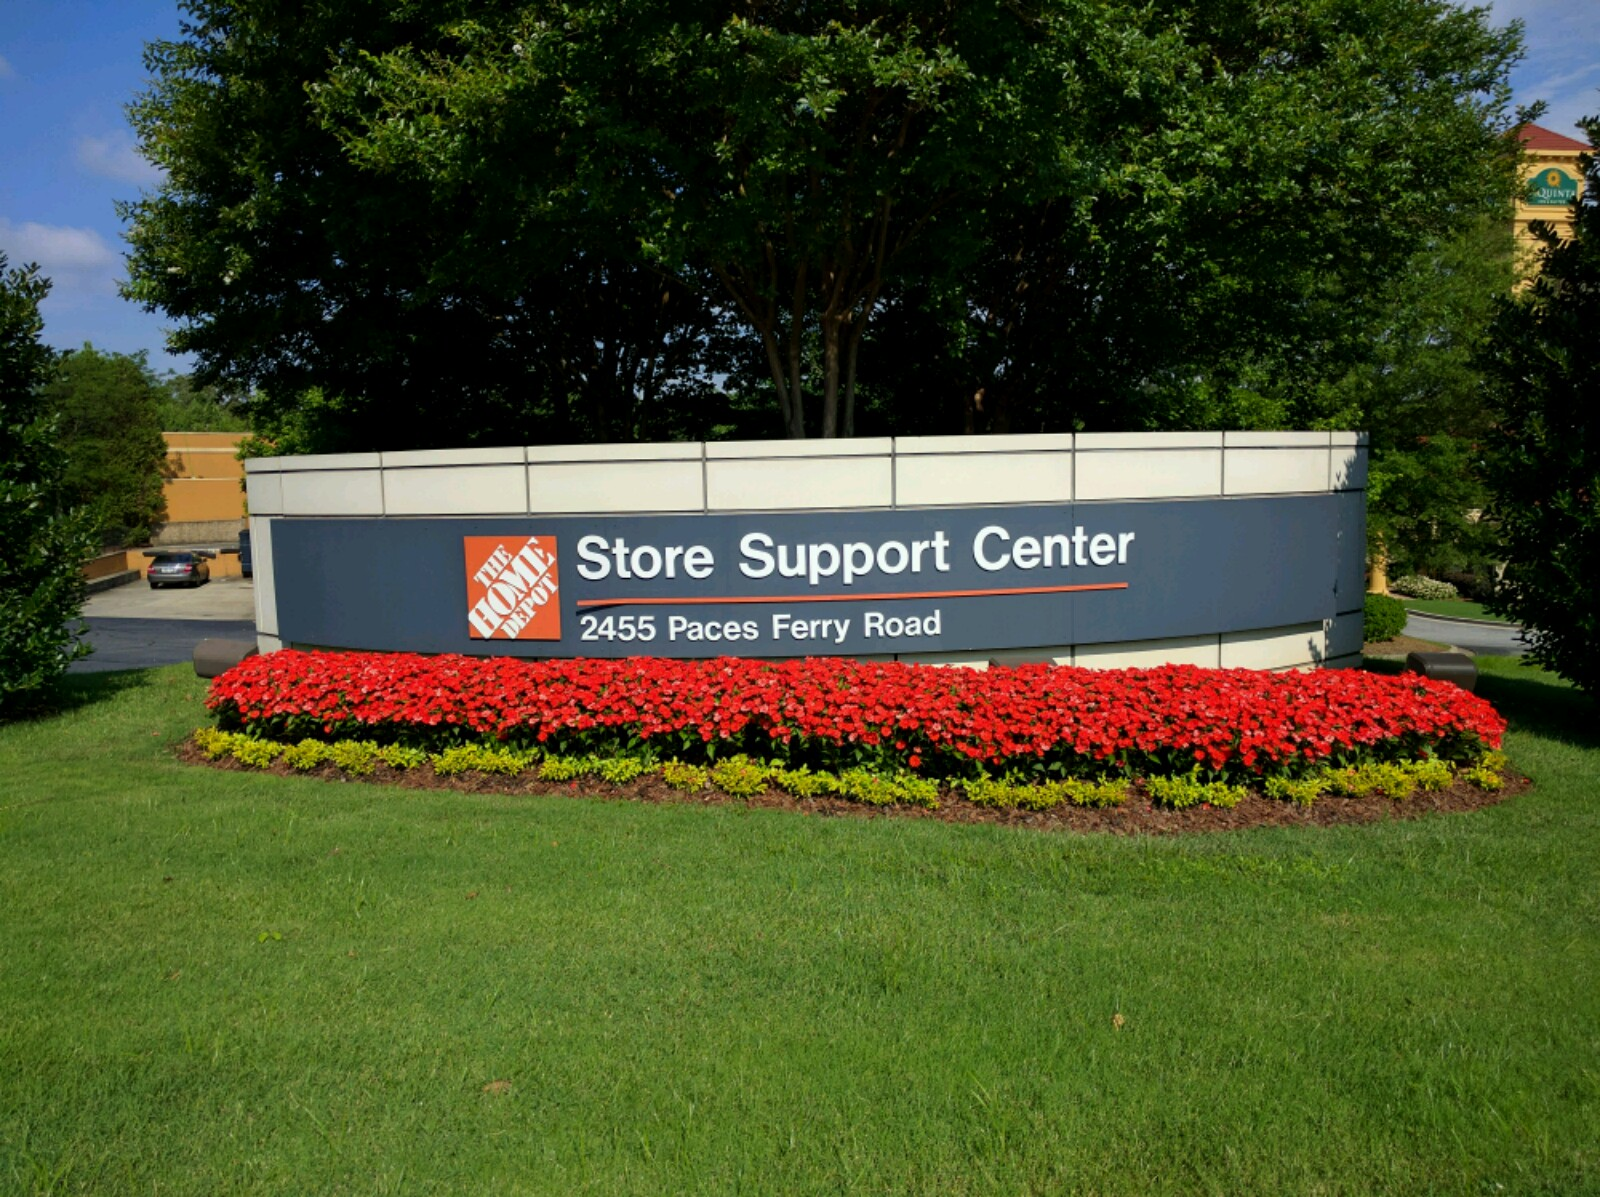 Entrance to Home Depot's corporate headquarters in Atlanta, Georgia.